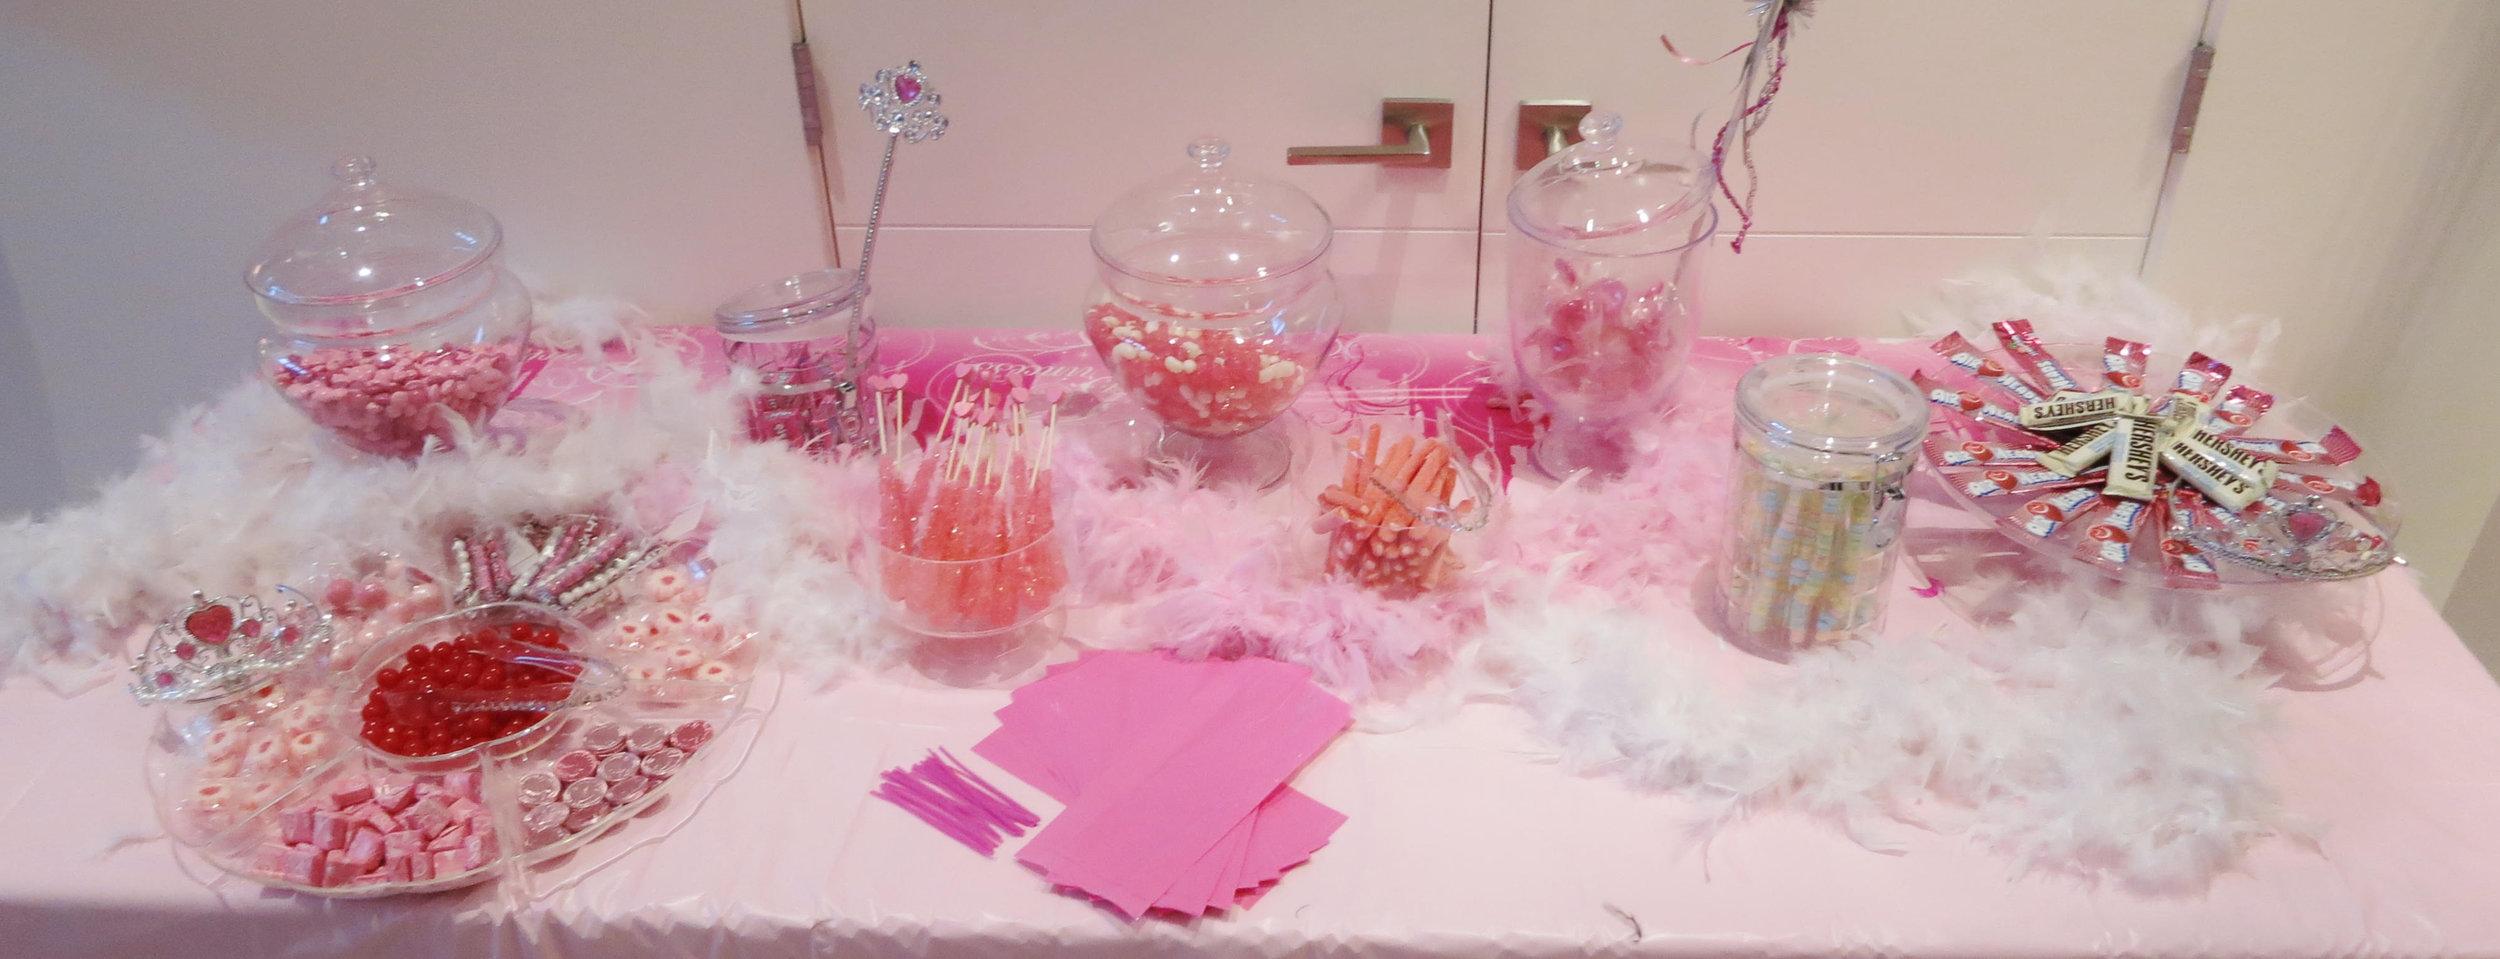 Black Licorice Candy Buffets Pink Hershey's.jpg